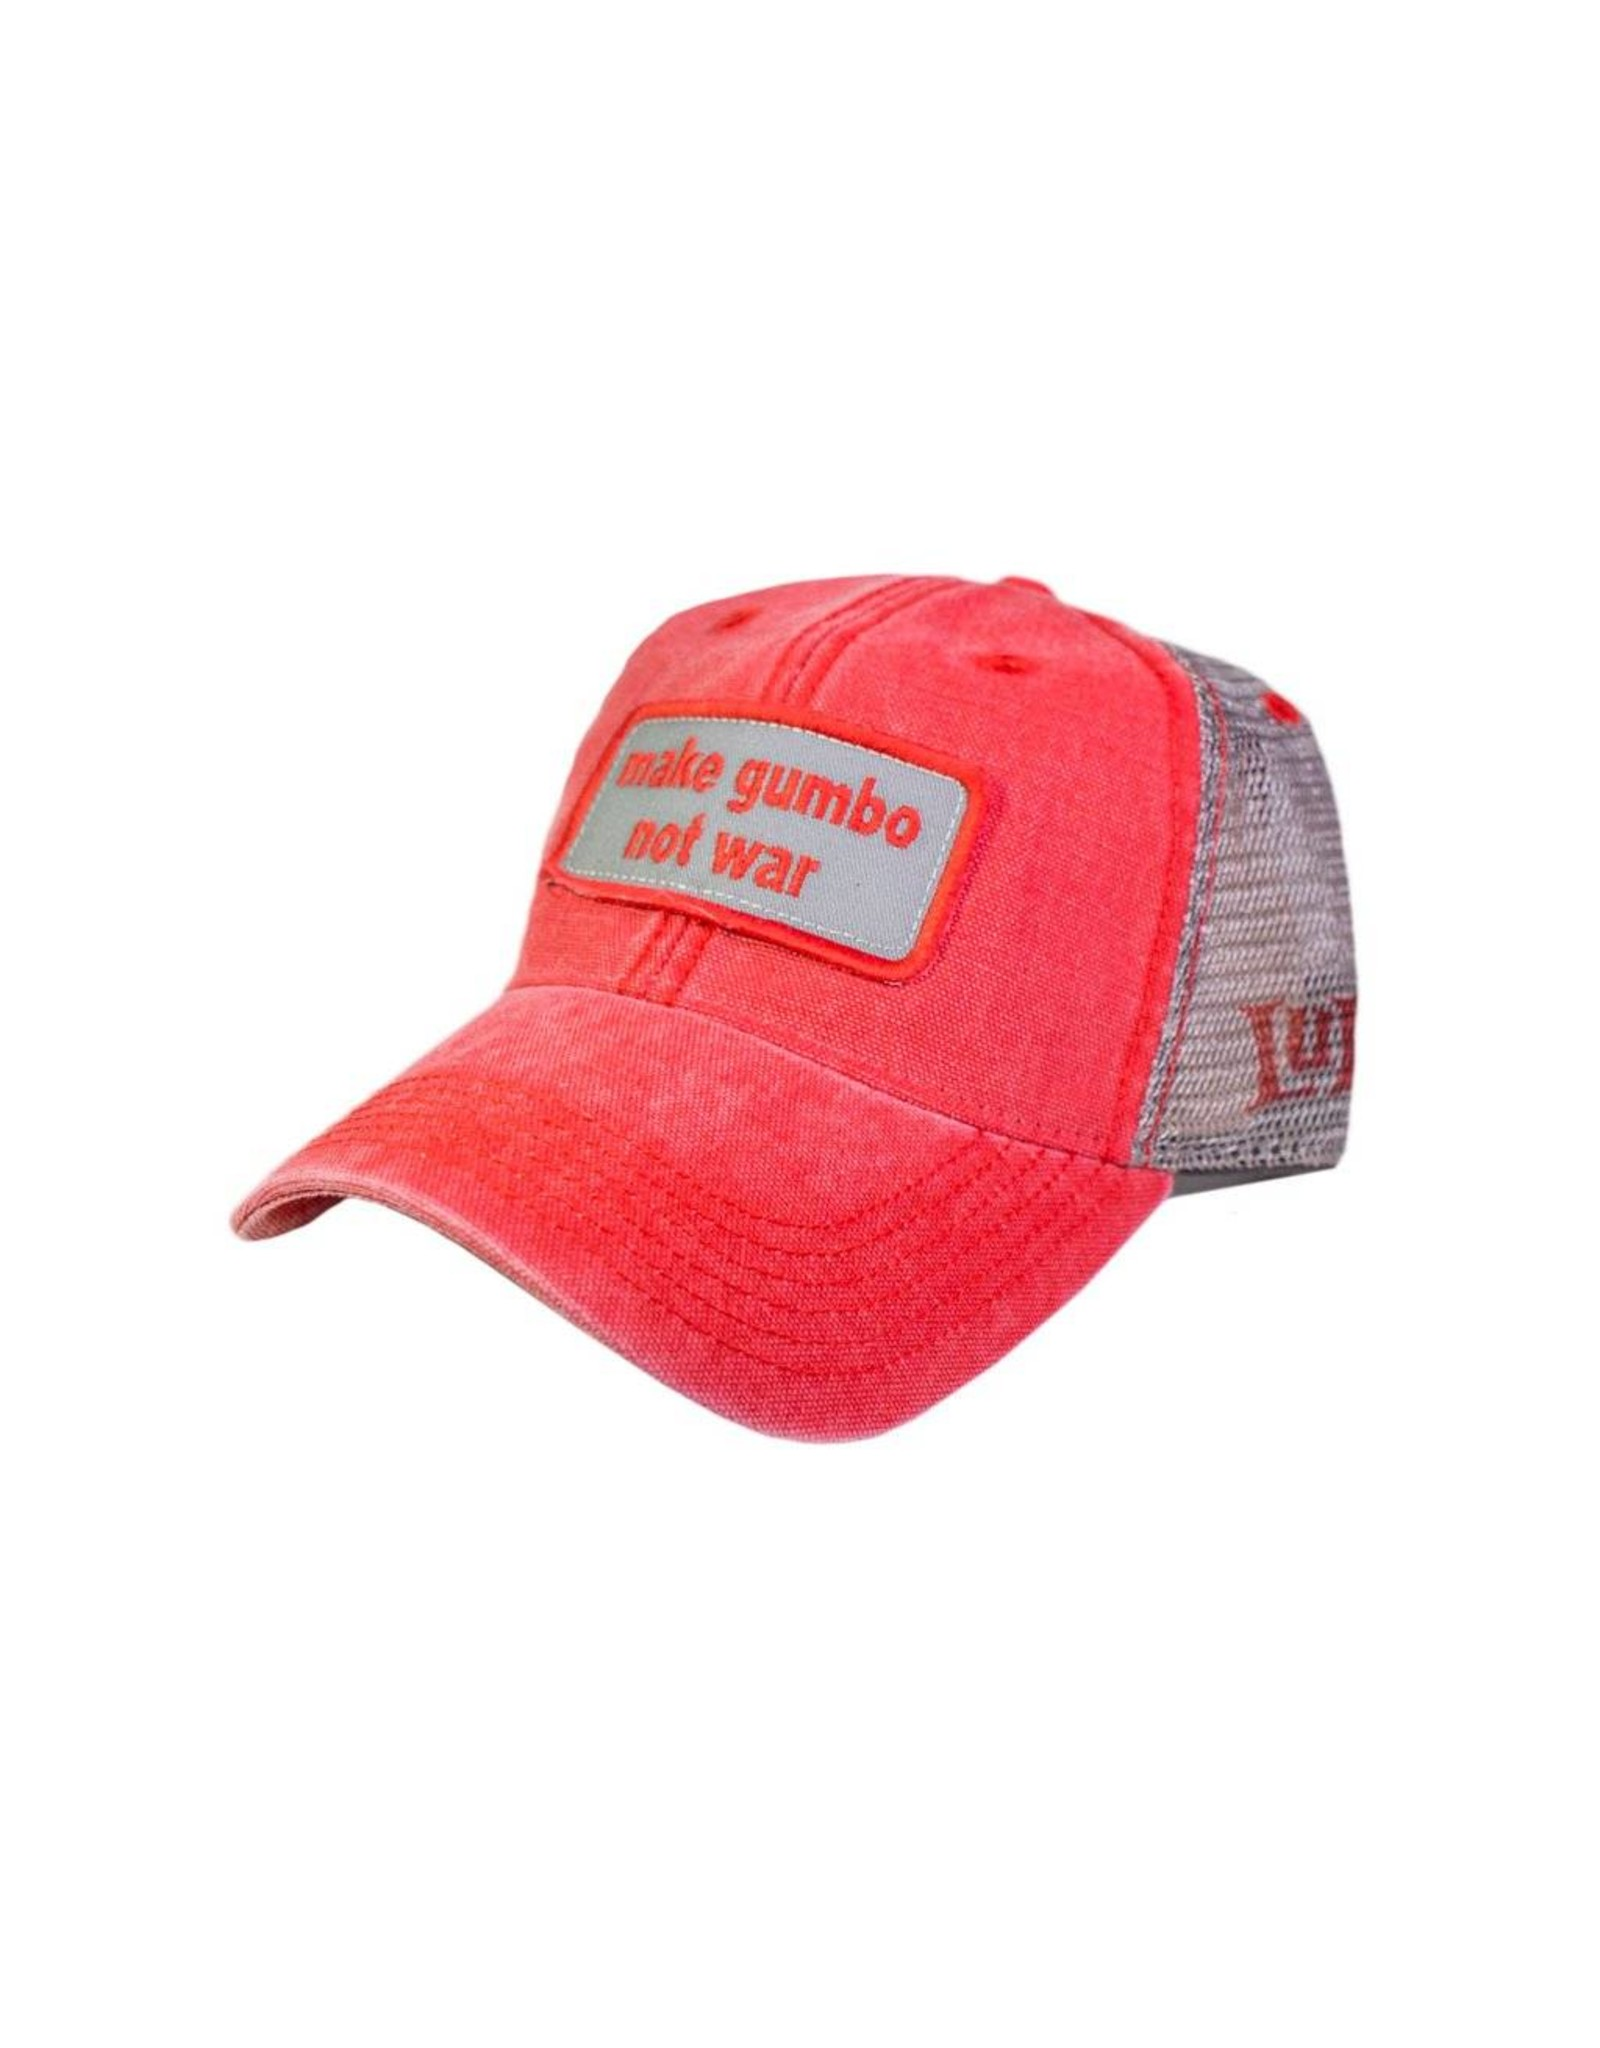 Make Gumbo Not War Trucker Hat